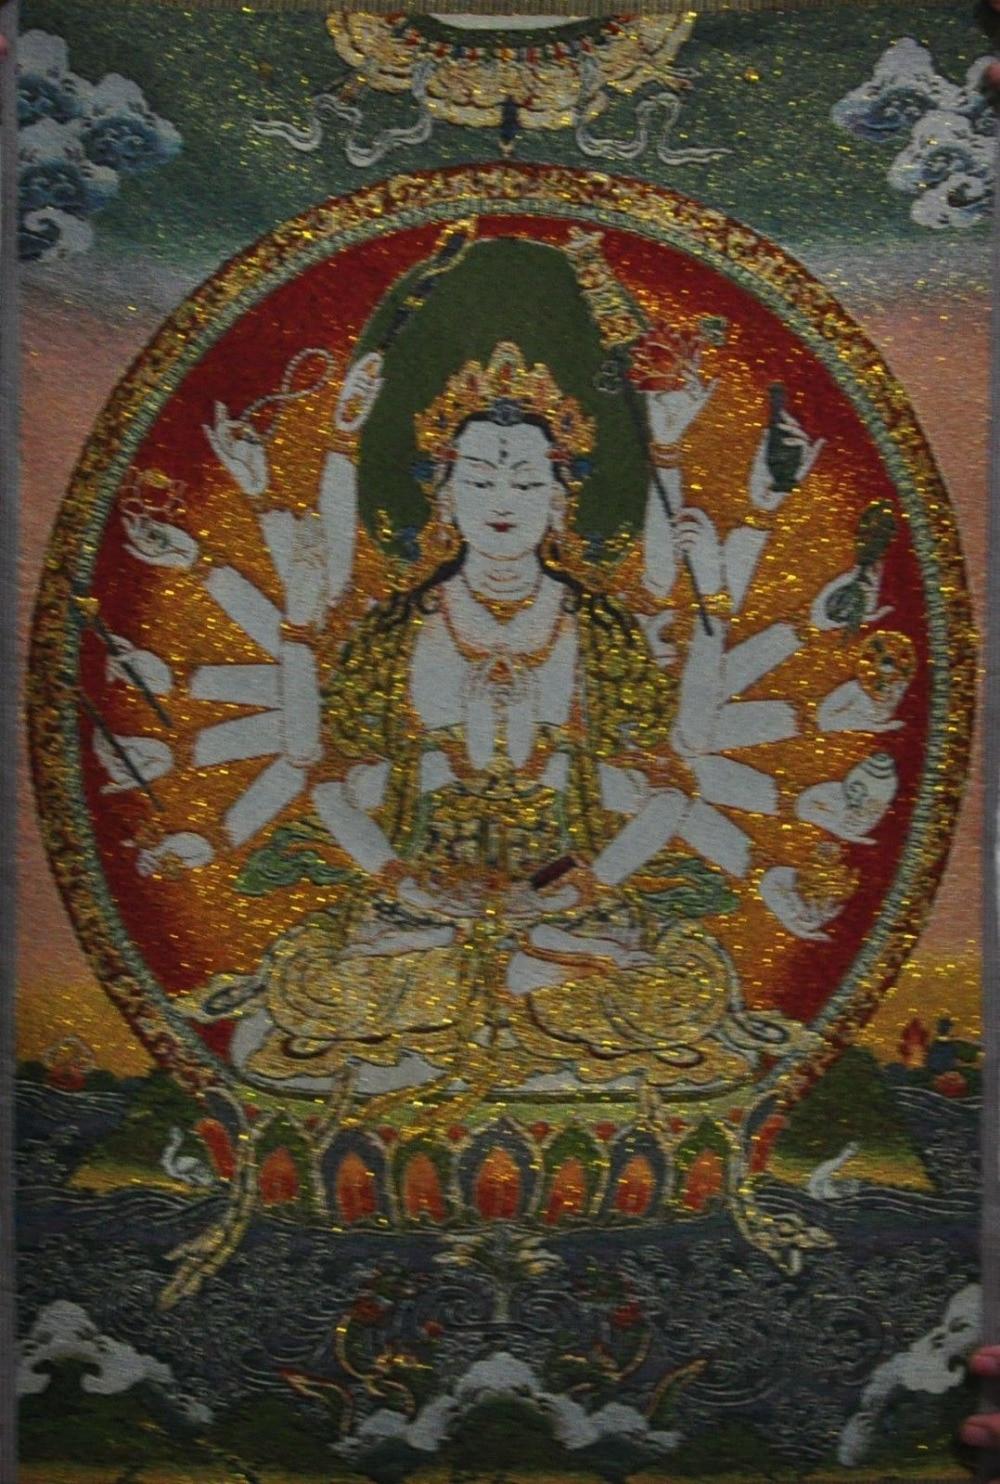 ᐊチベット仏教シルク刺繍タンカ...